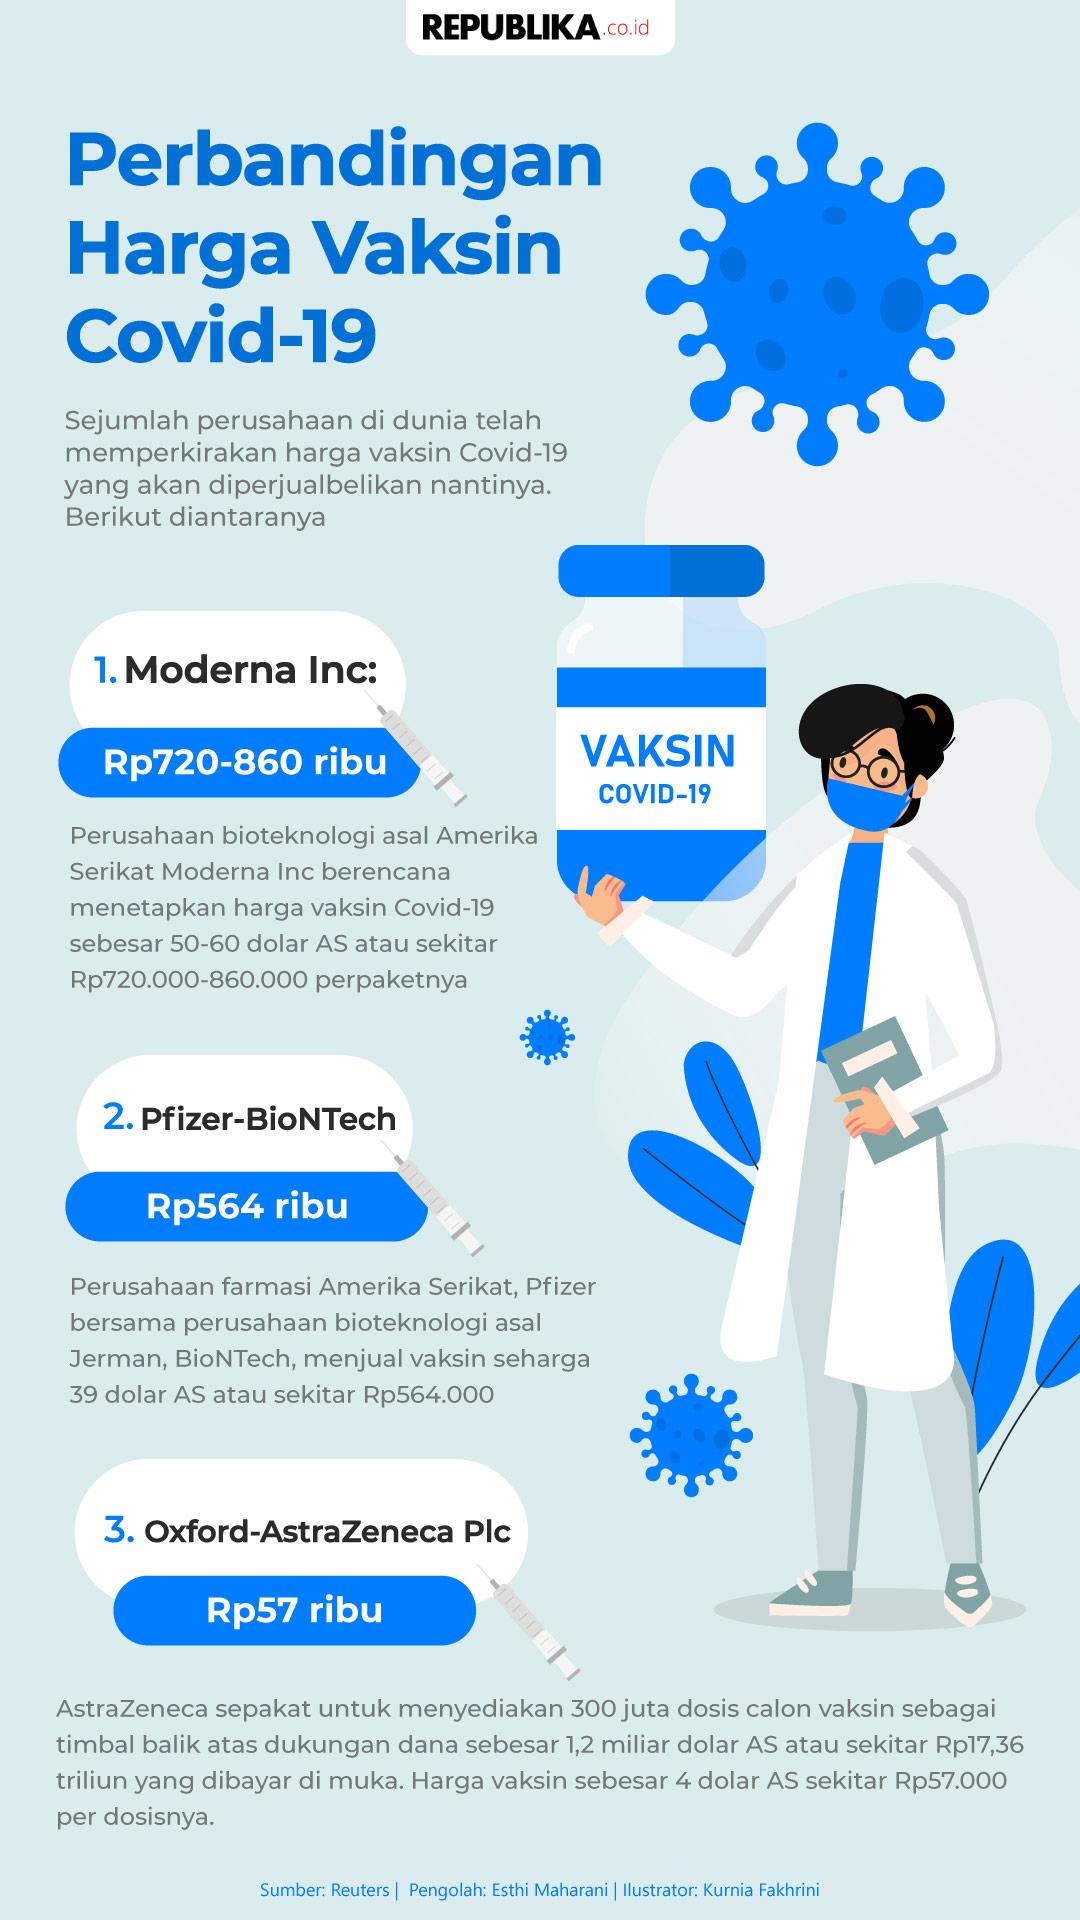 Infografis Perbandingan Harga Vaksin Covid-19   Republika ...